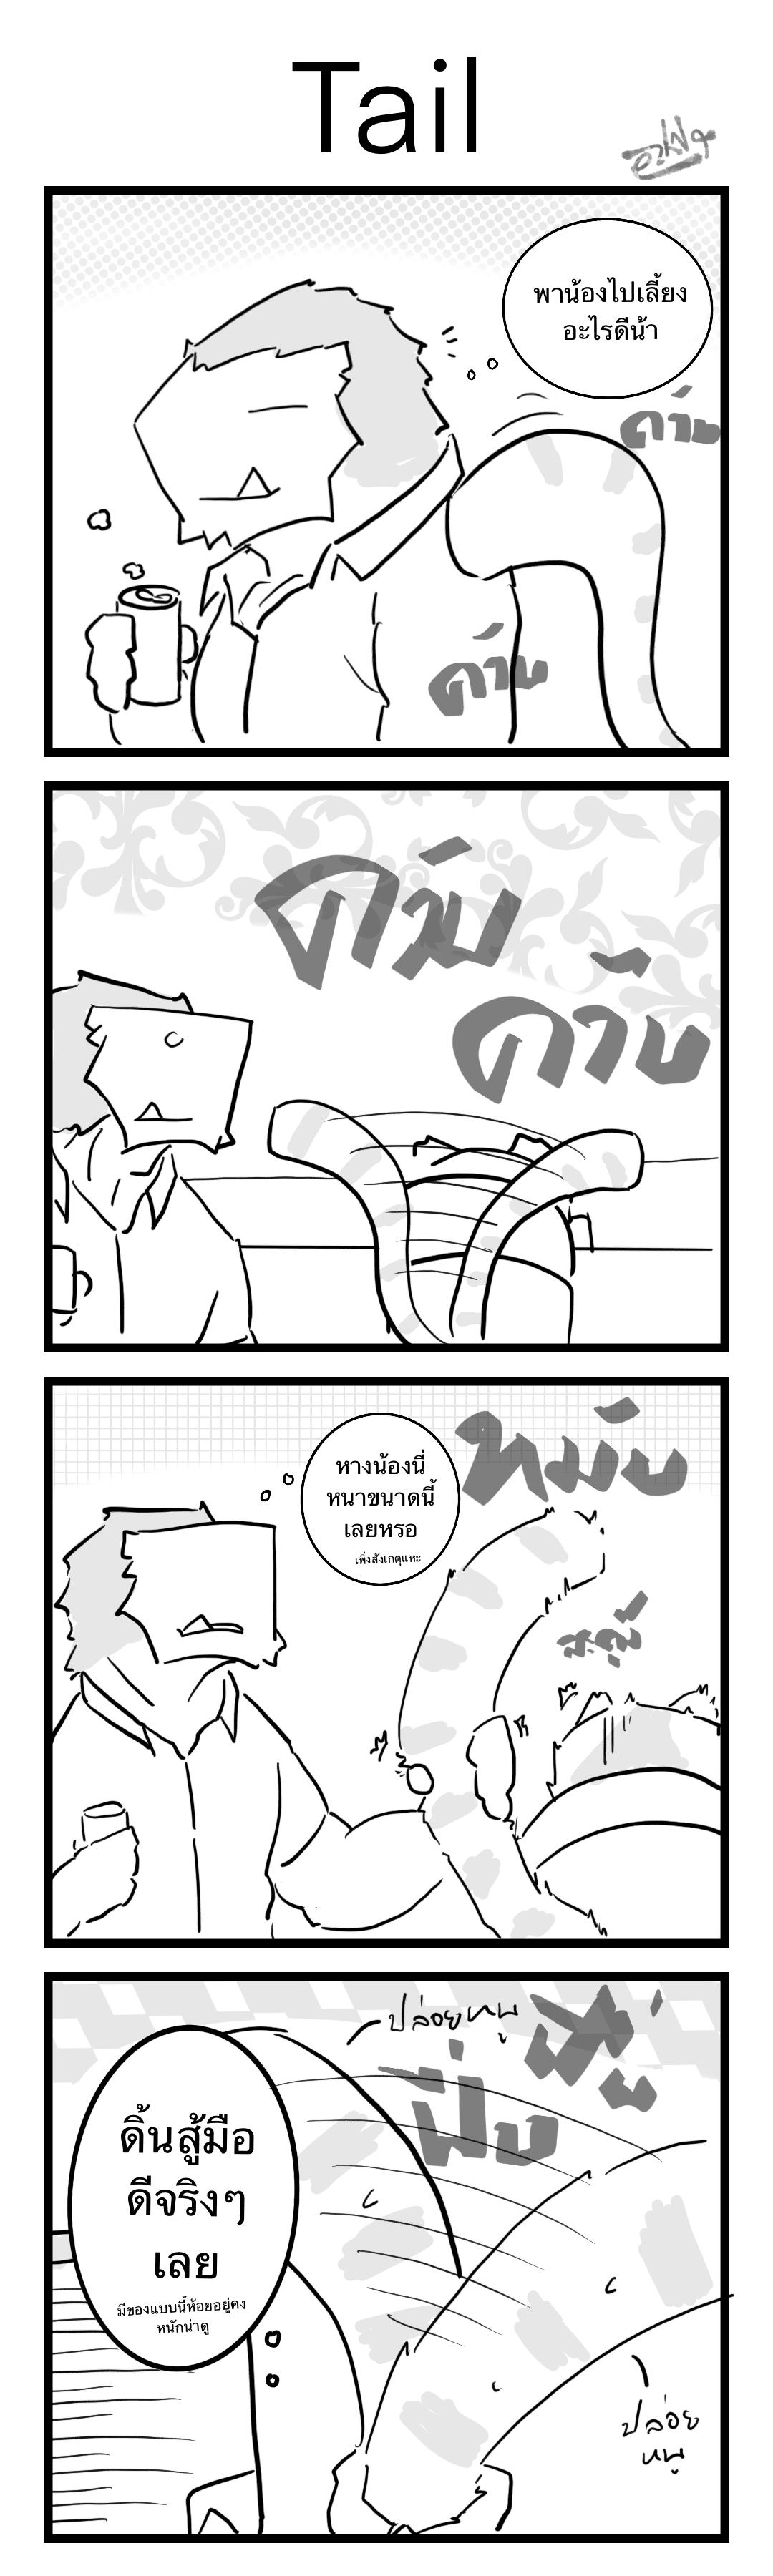 205 - Tail